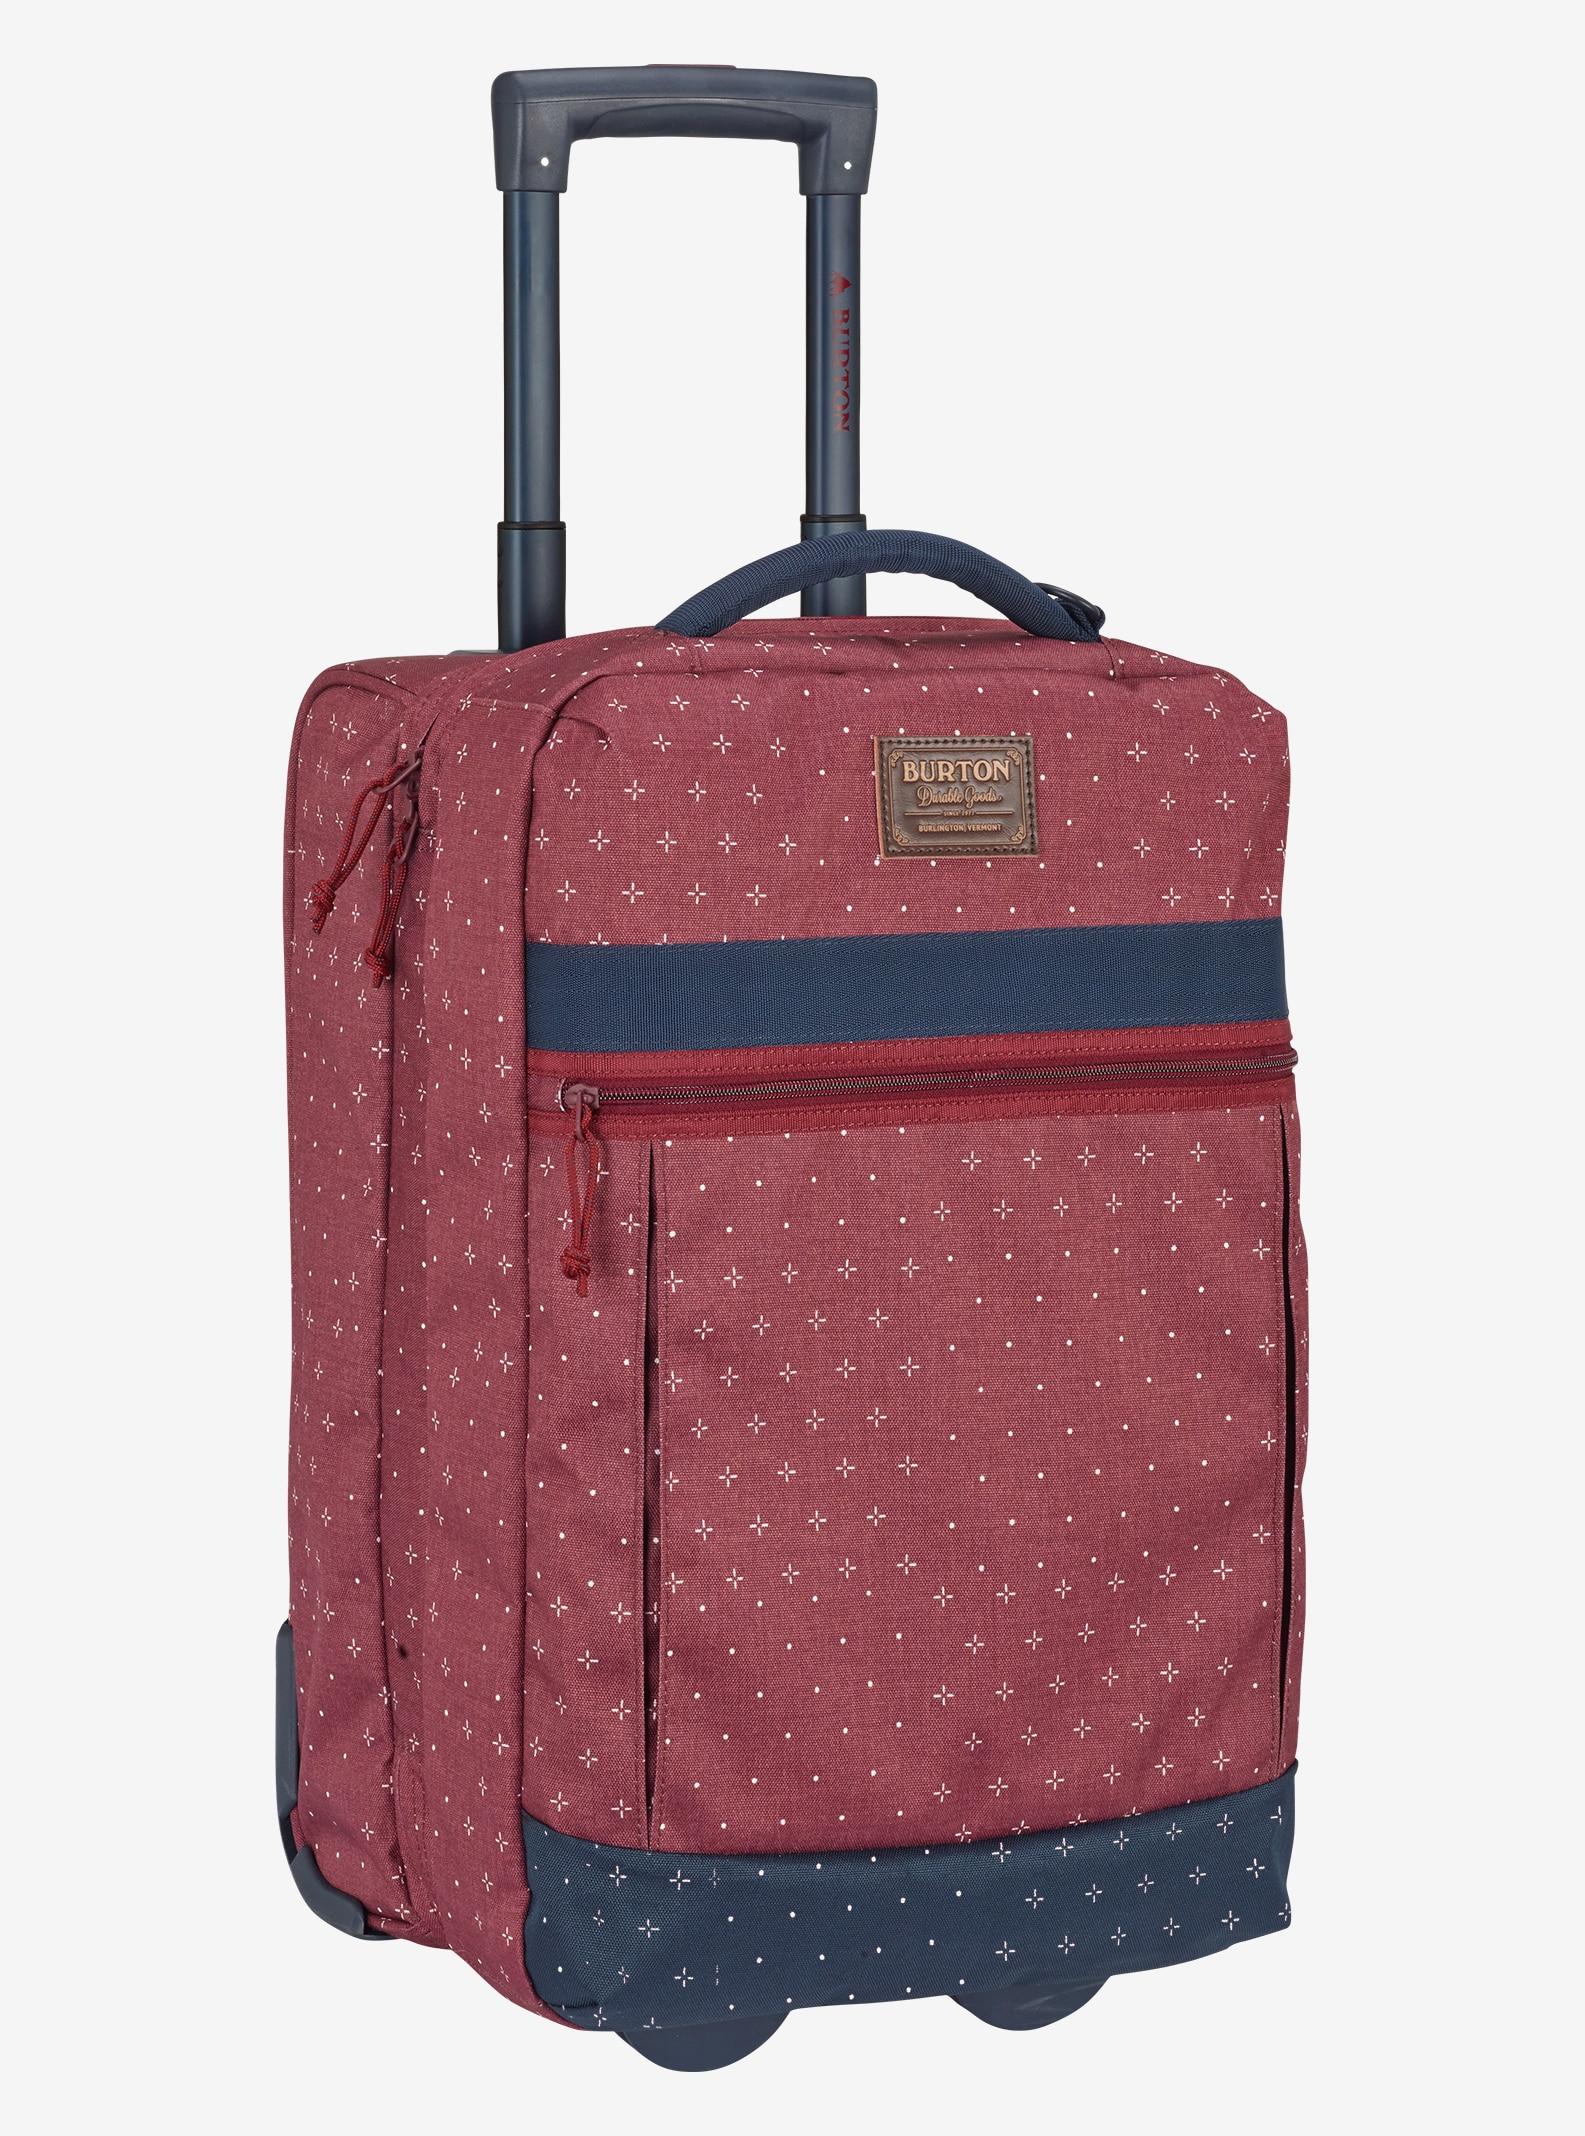 Burton Overnighter Roller Travel Bag shown in Mandana Print